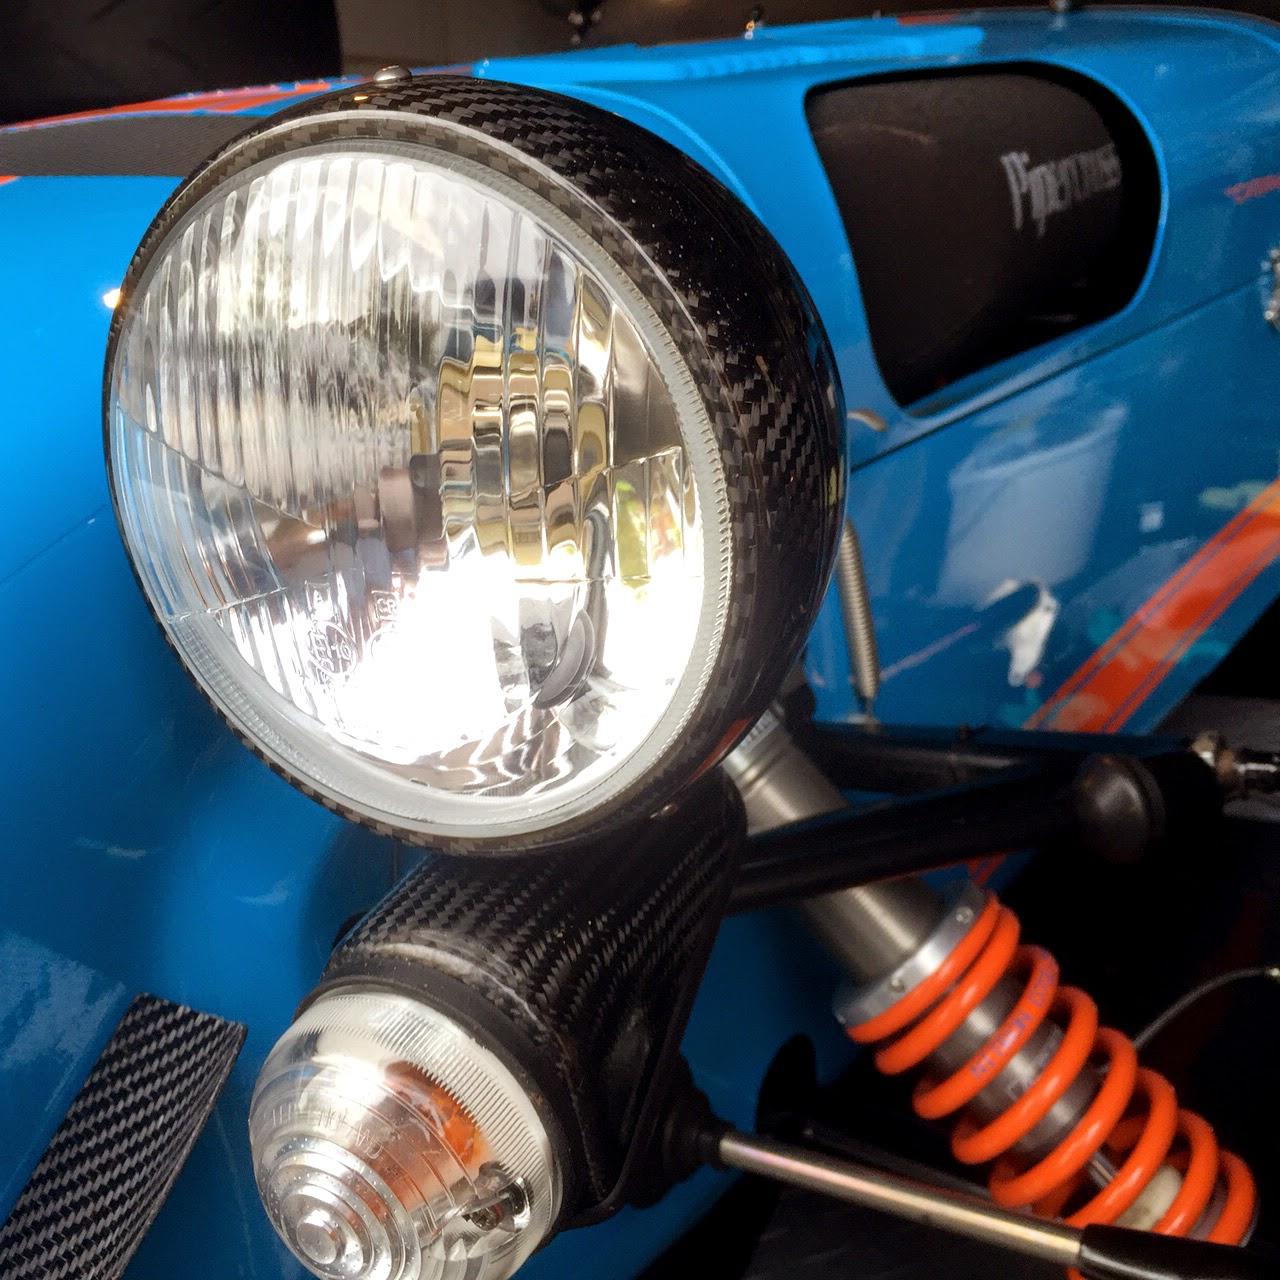 Caterham Singapore: 2018 Caterham Roadsport Racing Blog: My First 'Blat'tle Scar